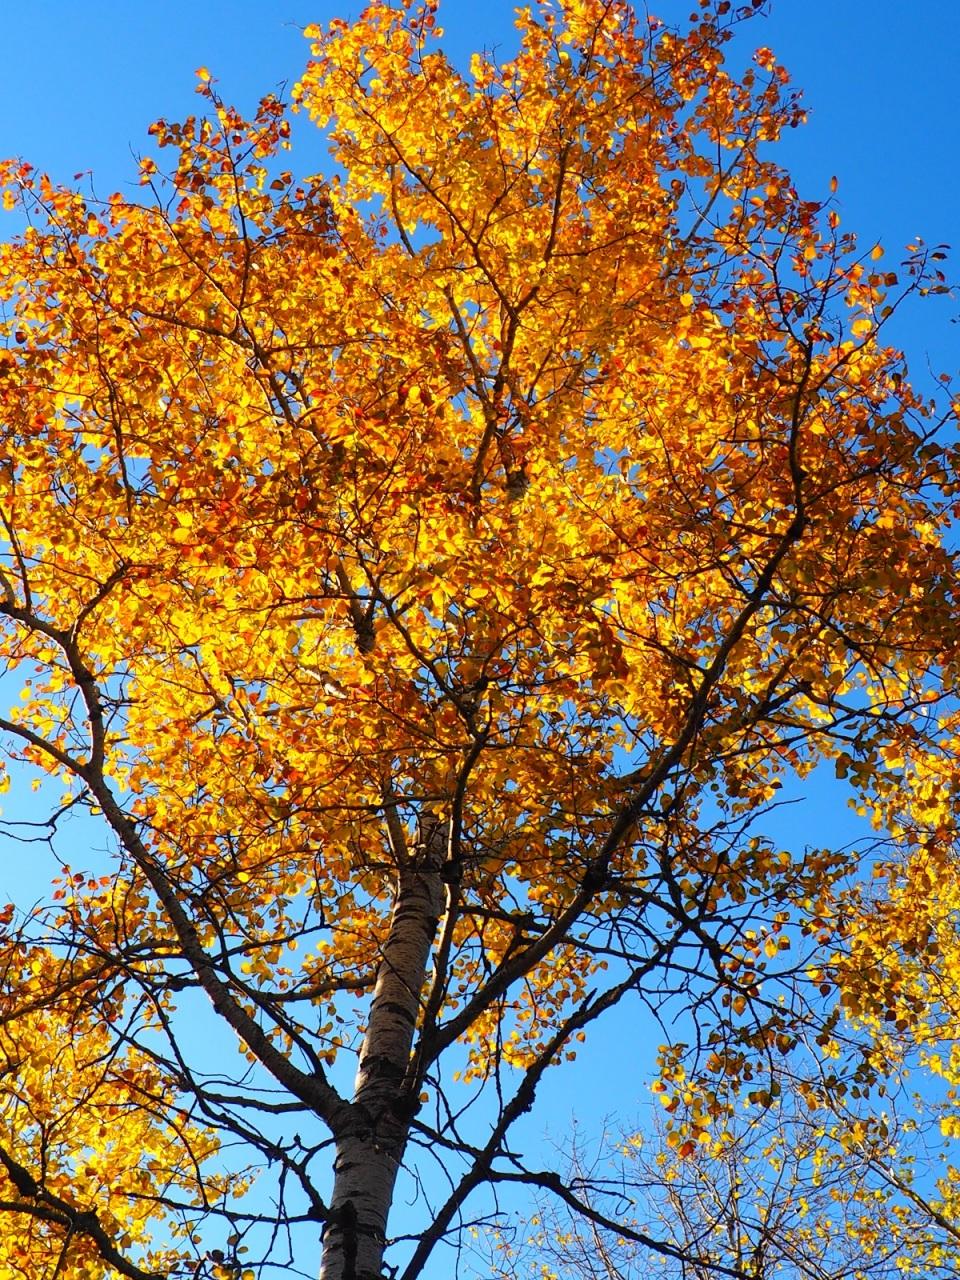 Spruce Bog Boardwalk Algonquin Park, Ontario, Simergphotos, Canada, Autumn 2019